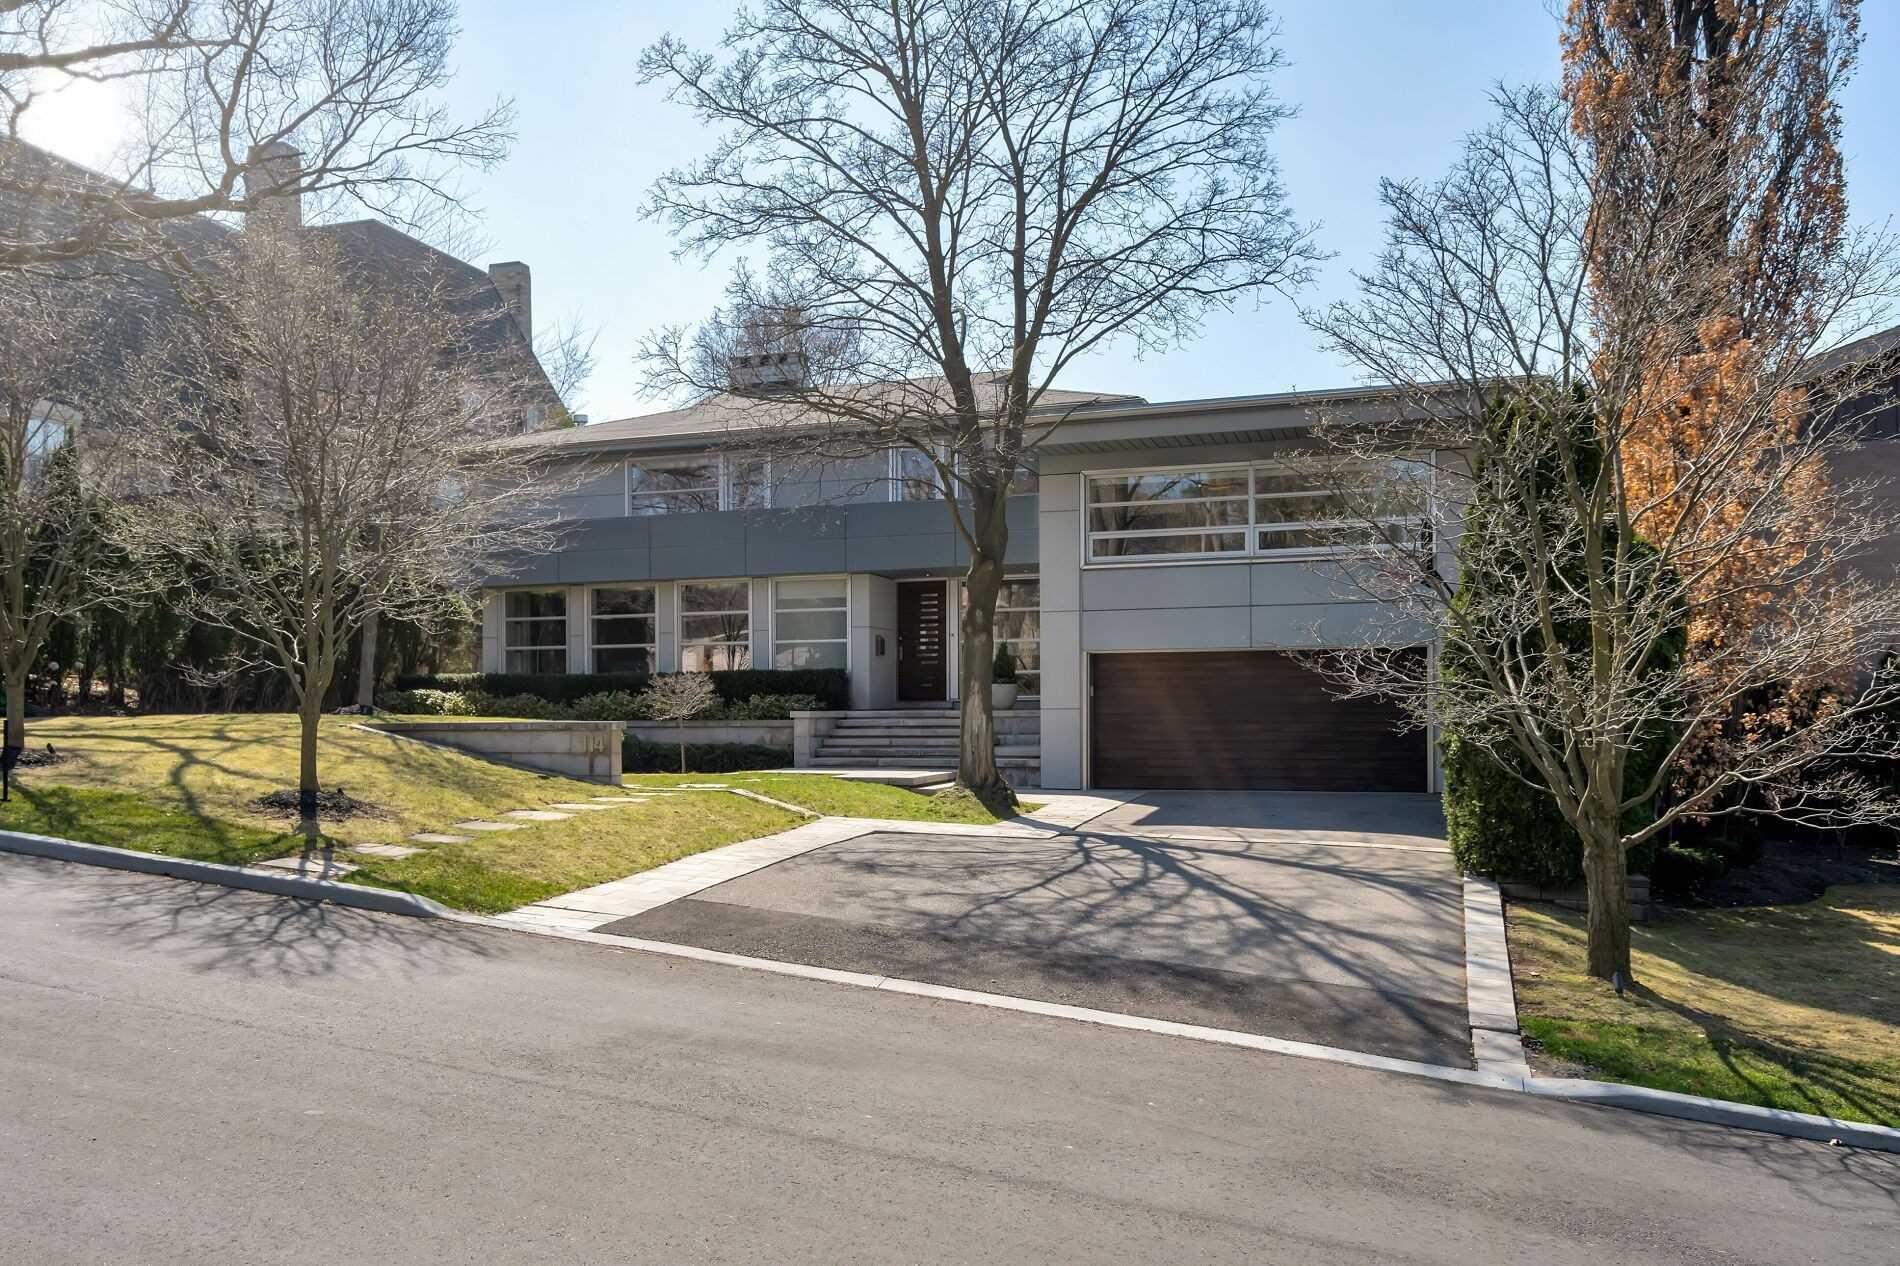 114 Richview Ave, Toronto, Ontario M5P3E9, 6 Bedrooms Bedrooms, 13 Rooms Rooms,7 BathroomsBathrooms,Detached,For Sale,Richview,C5233016